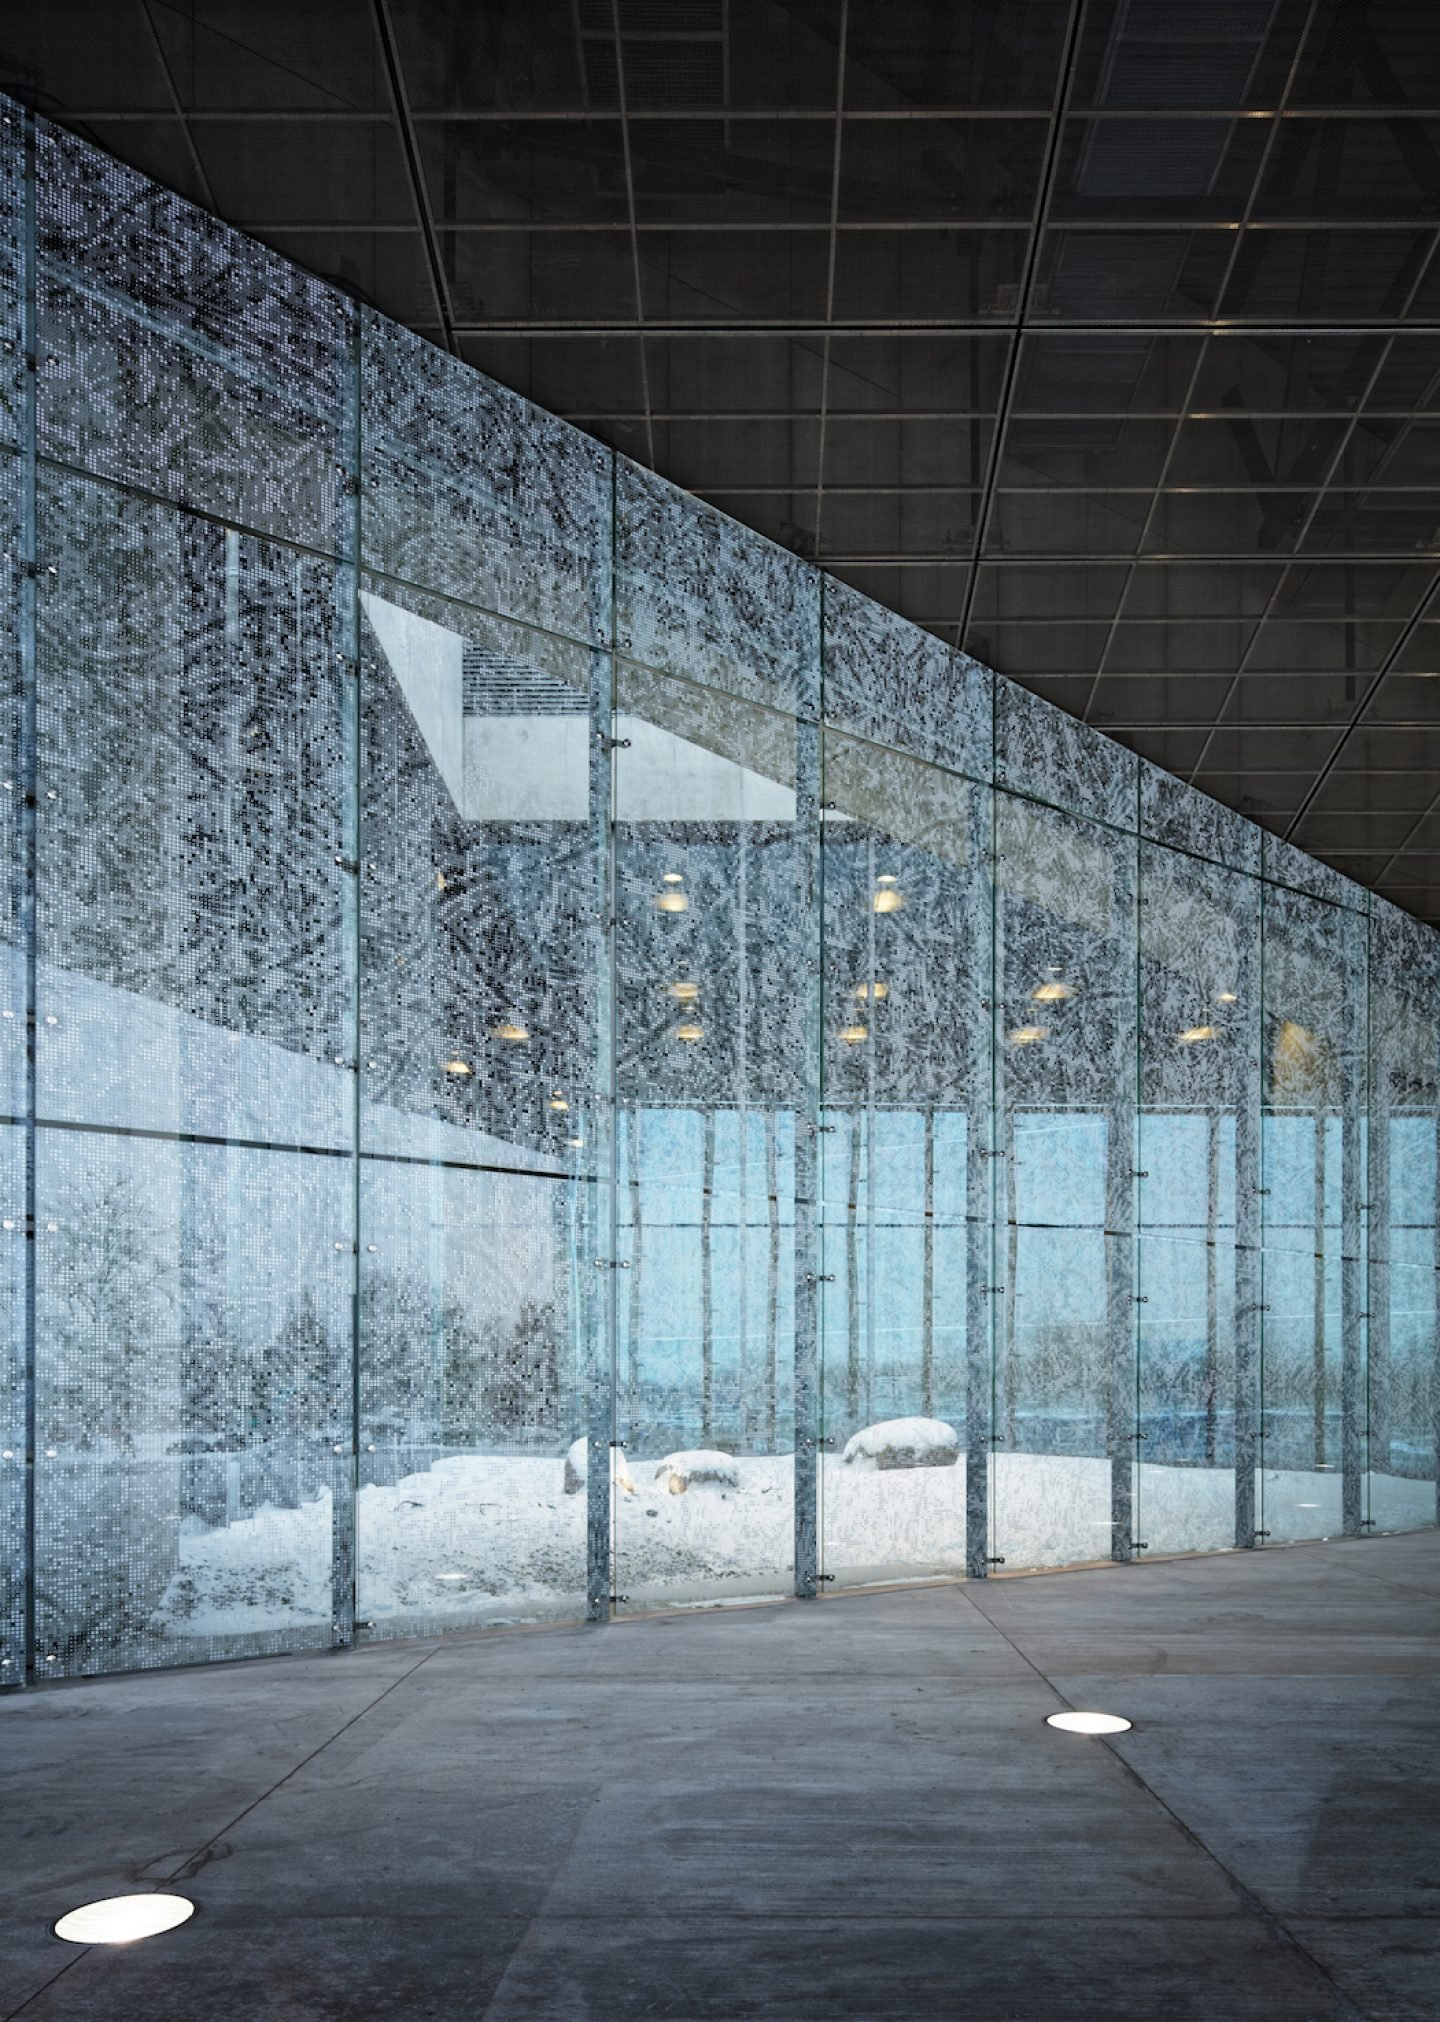 DGT_Architecture_1917_DxO @TAKUJI SHIMMURA LR